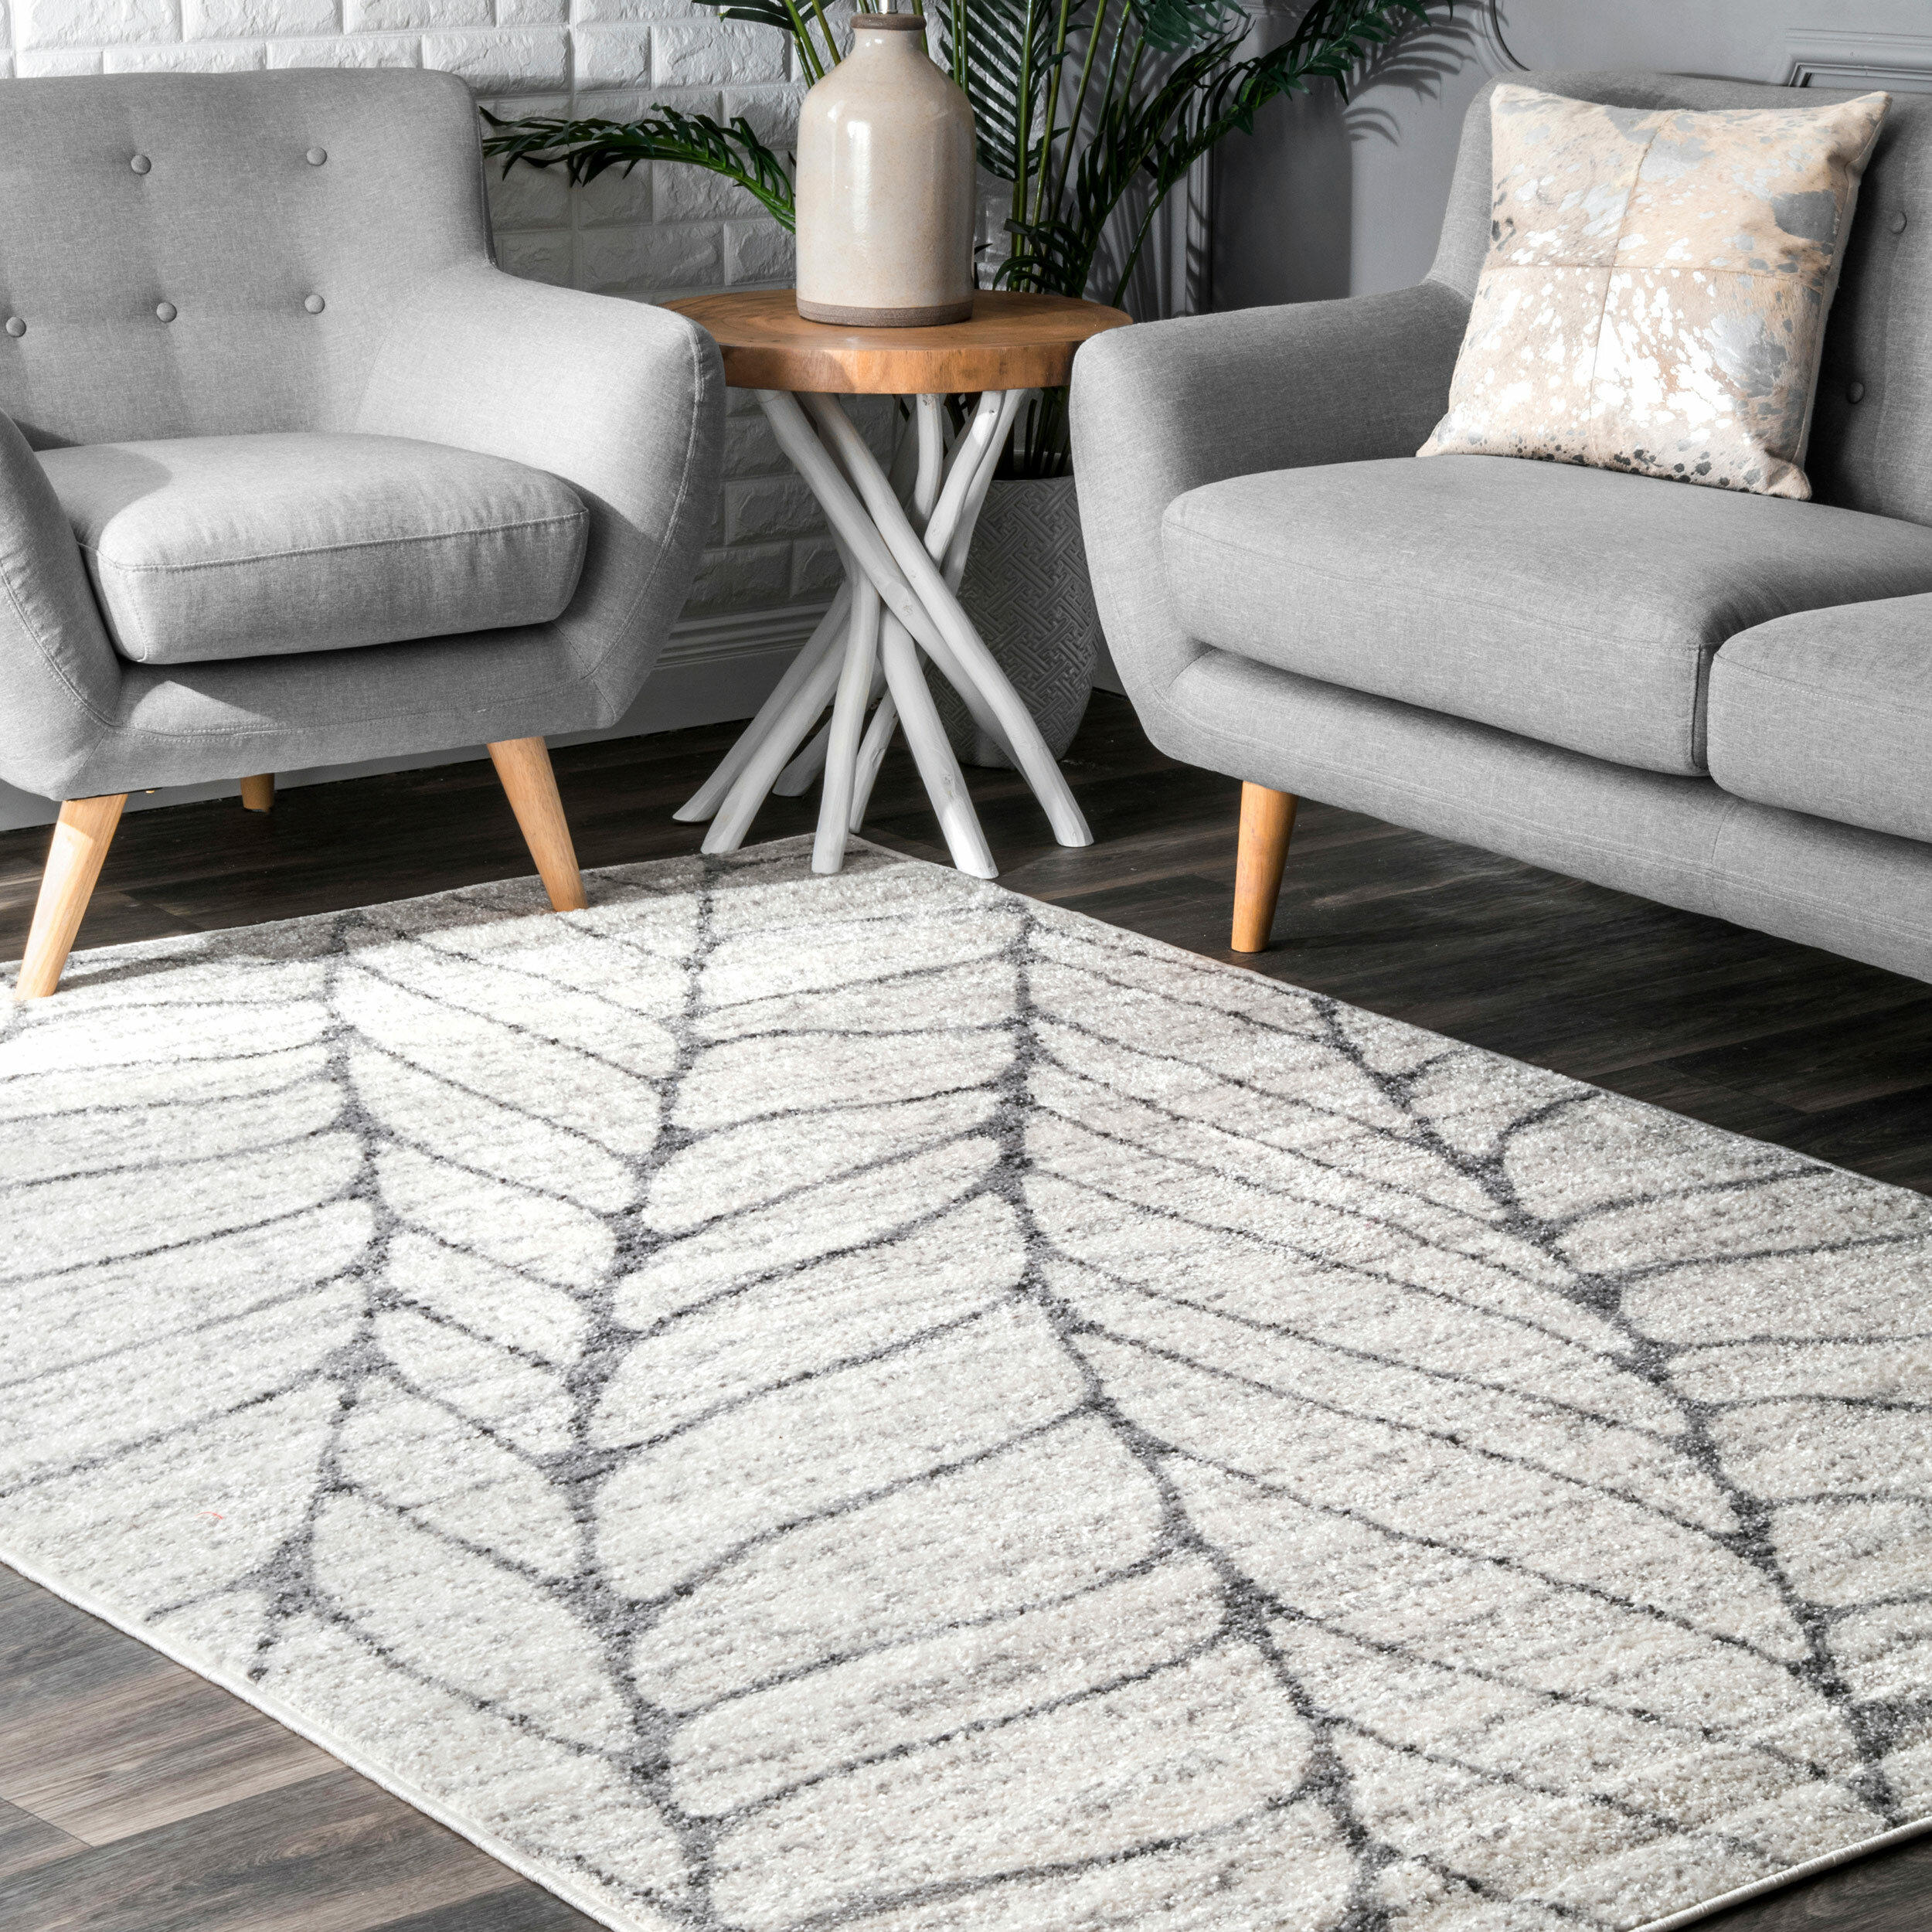 Incredible Sackett Light Gray Area Rug Lamtechconsult Wood Chair Design Ideas Lamtechconsultcom